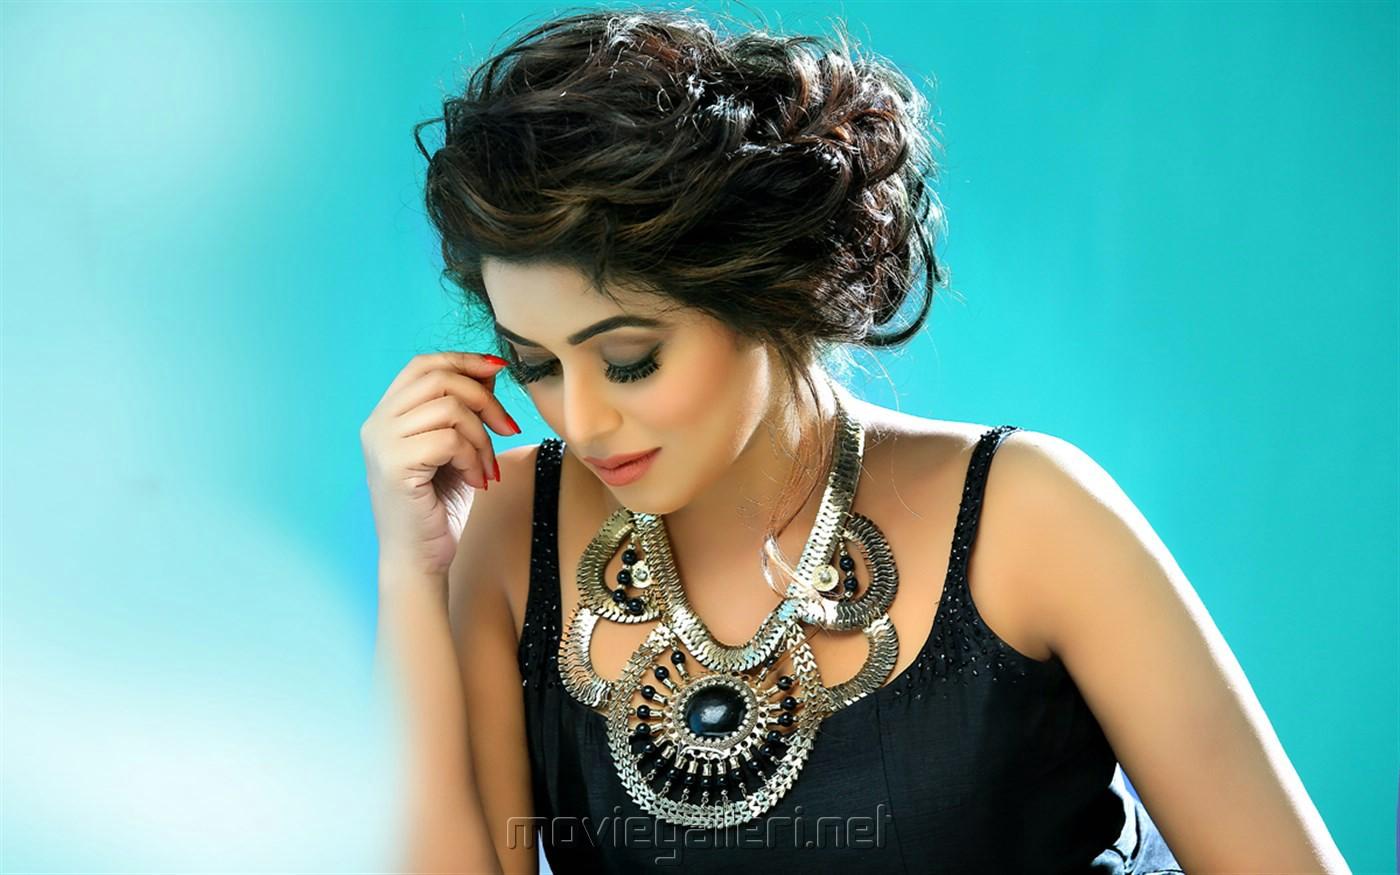 Actress Poorna Photoshoot Stills